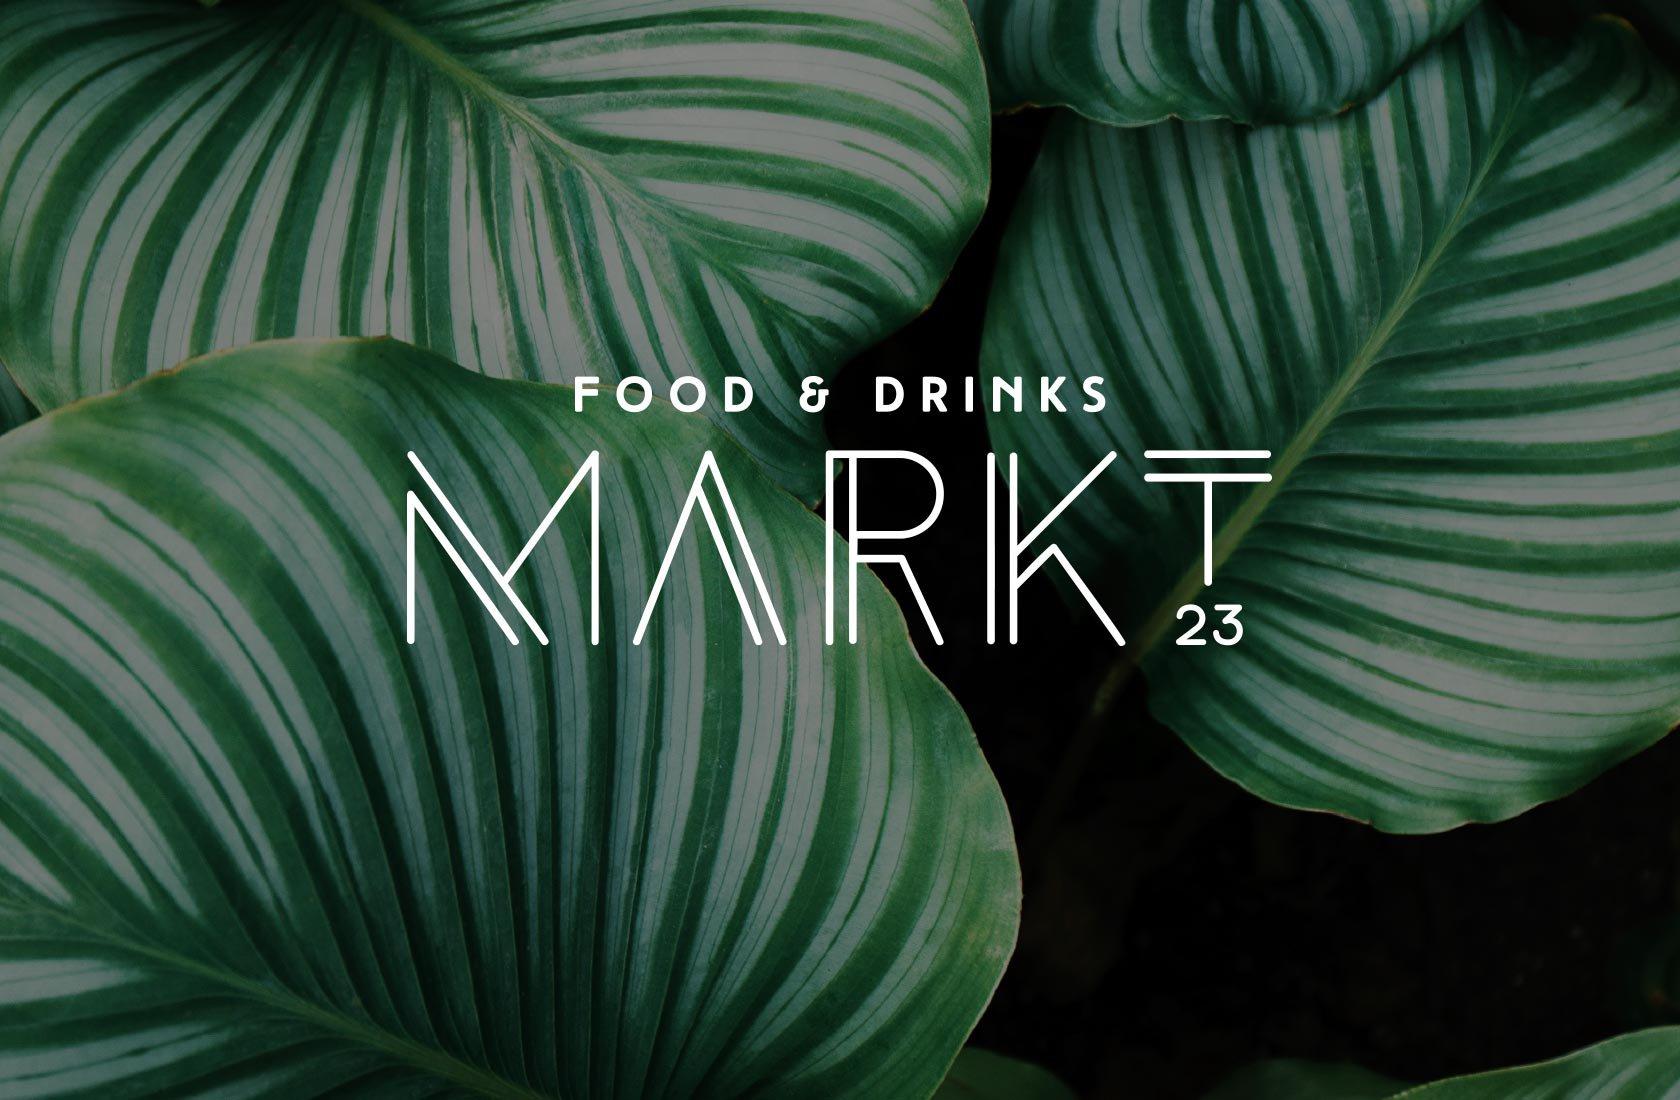 branding_markt23_1680x1100